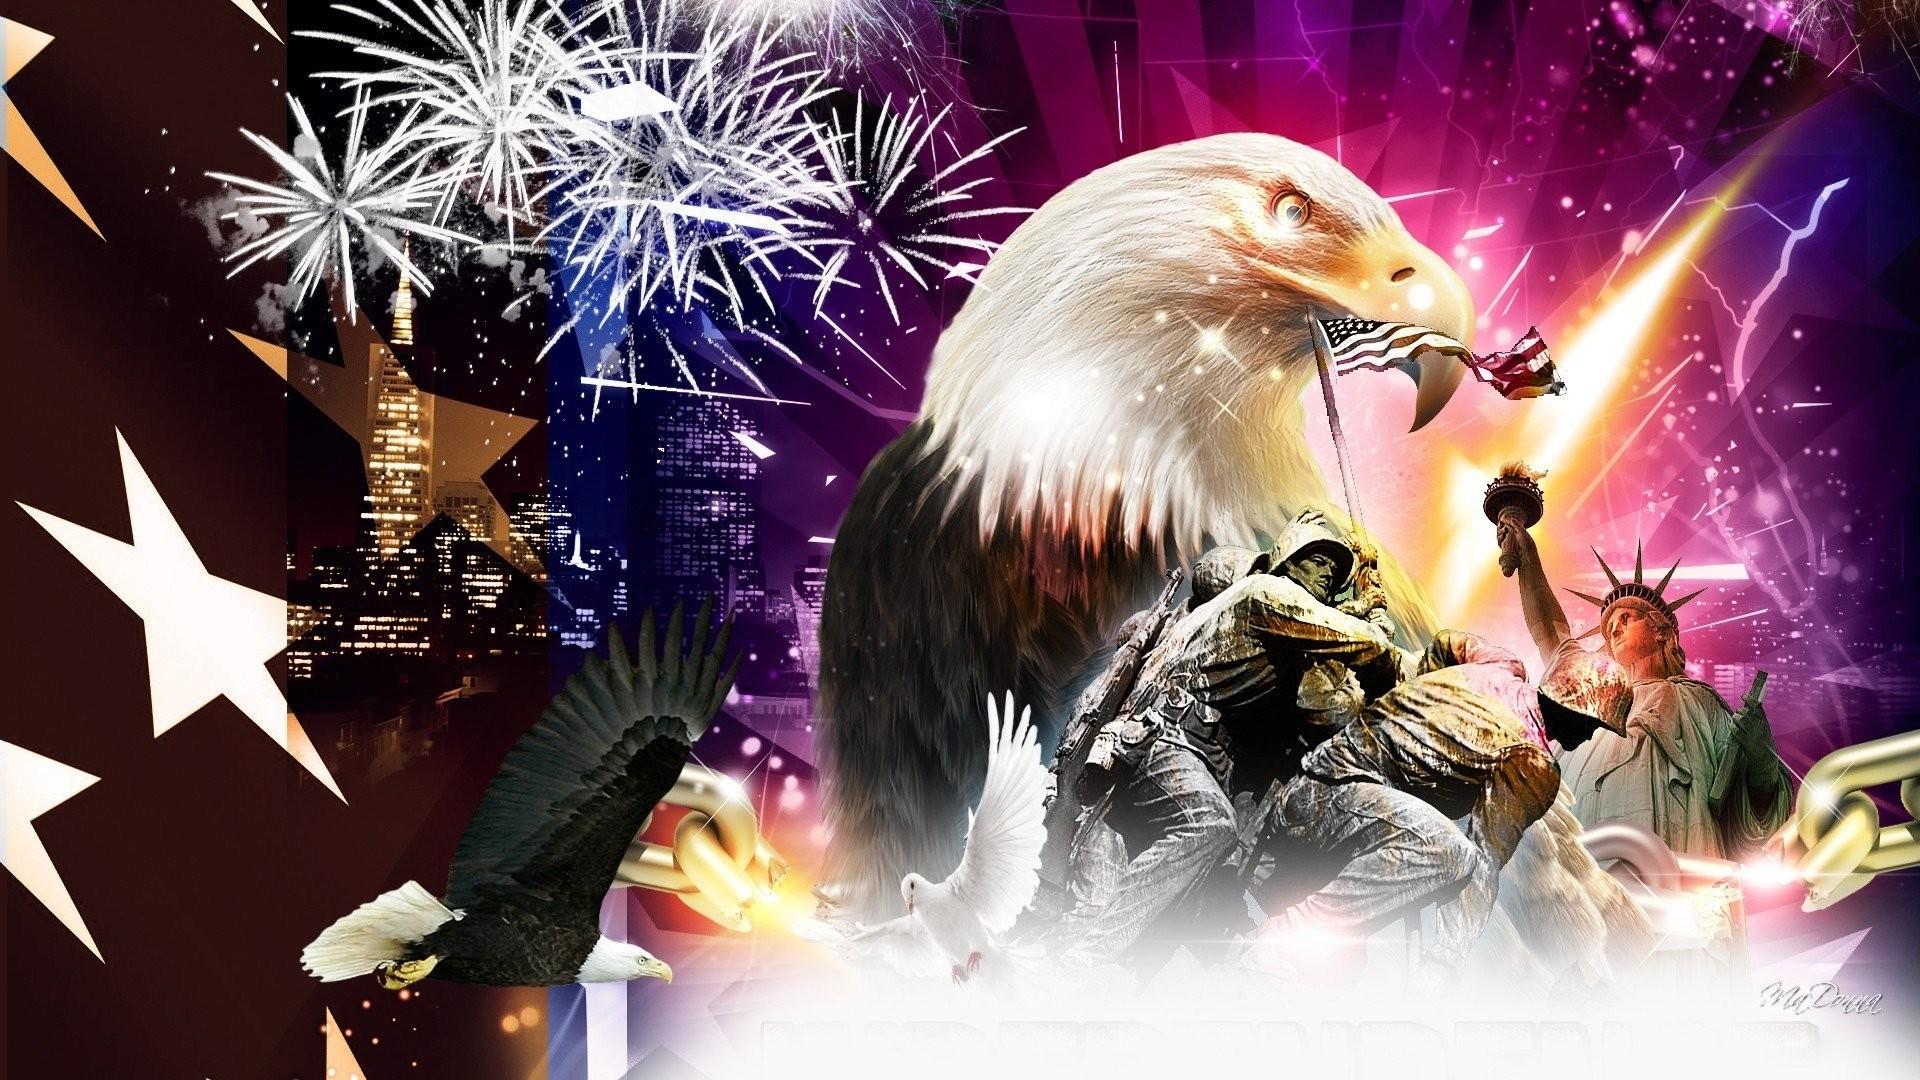 4th july fireworks eagle mood america usa wallpaper     421613    WallpaperUP